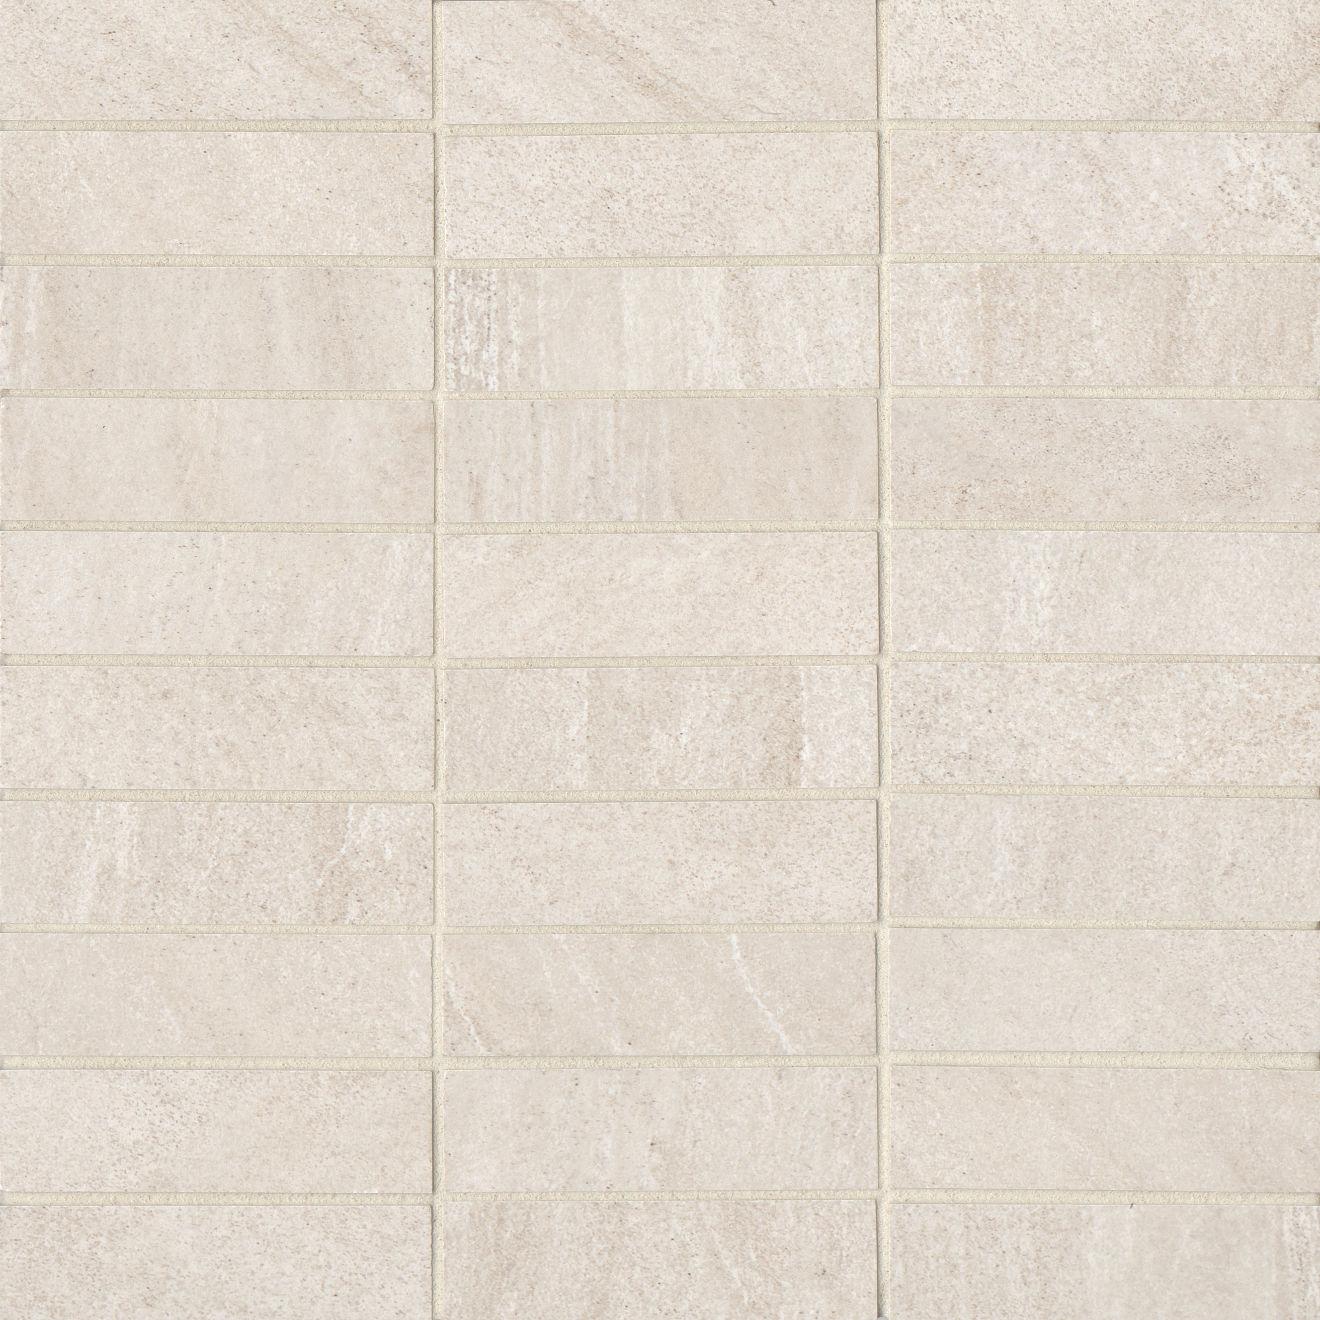 "Purestone 1""x4"" Matte Porcelain Mosaic Tile in Beige"